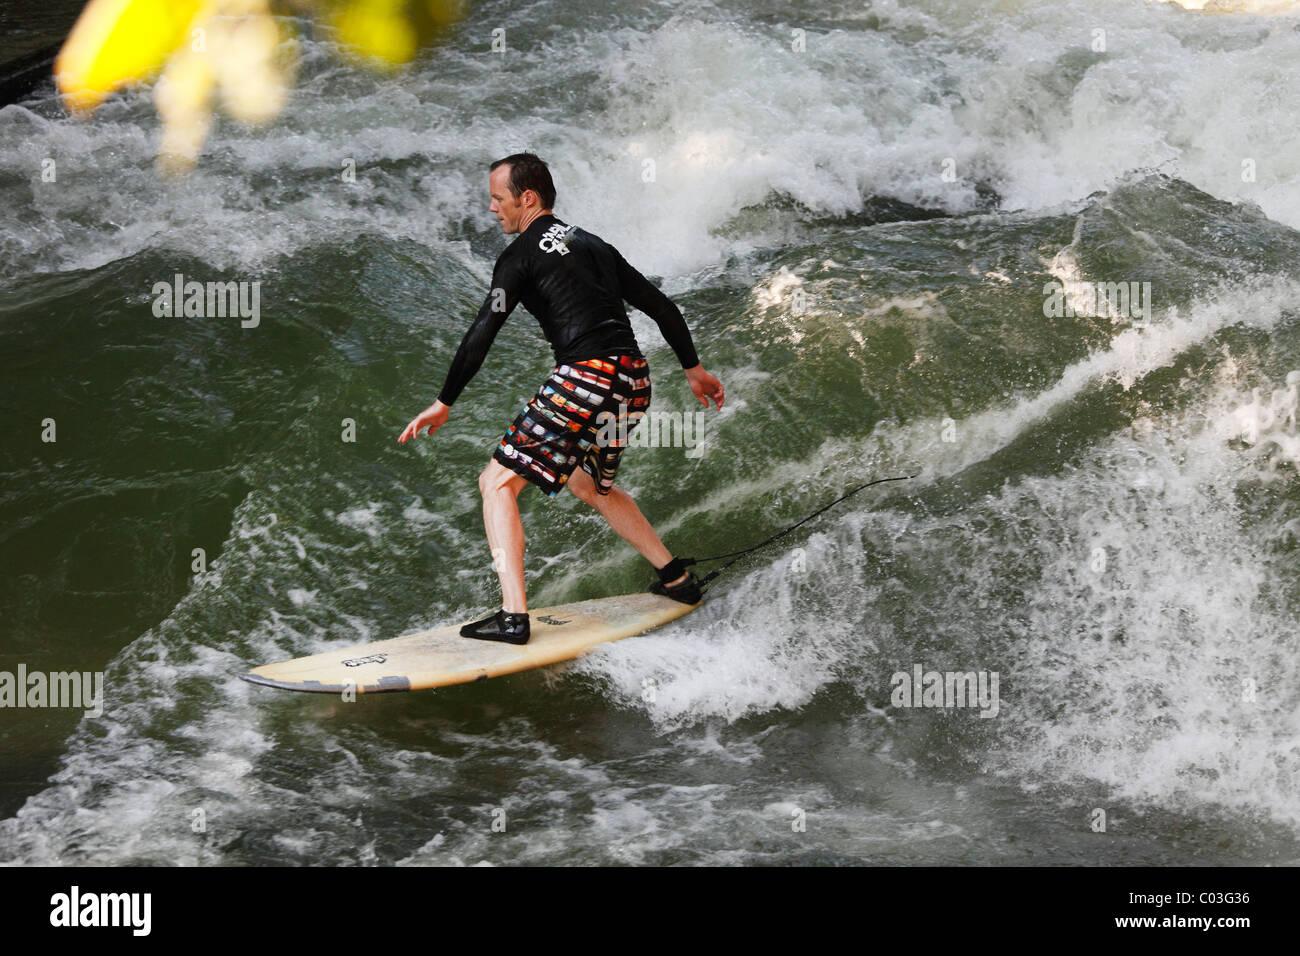 Surfer on a wave in the Eisbach stream, English Garden, Munich, Upper Bavaria, Bavaria, Germany, Europe Stock Photo